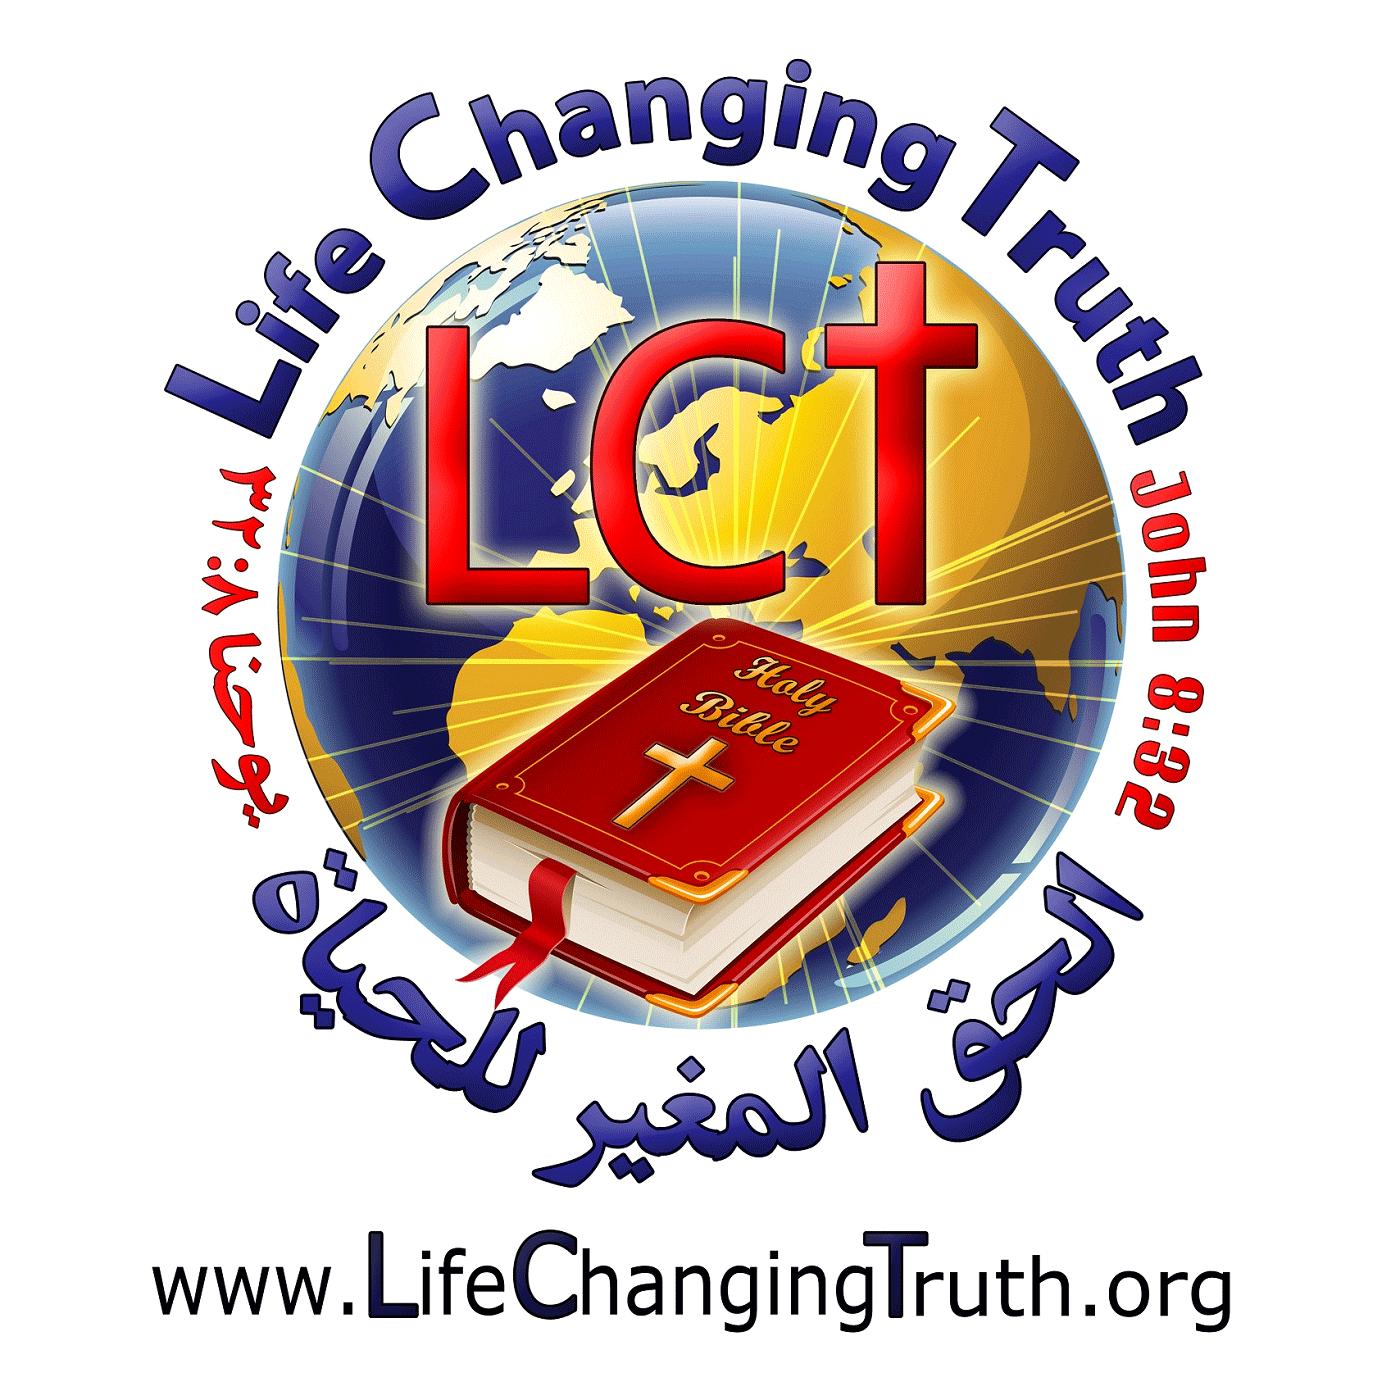 Life Changing Truth الحق المغير للحياة